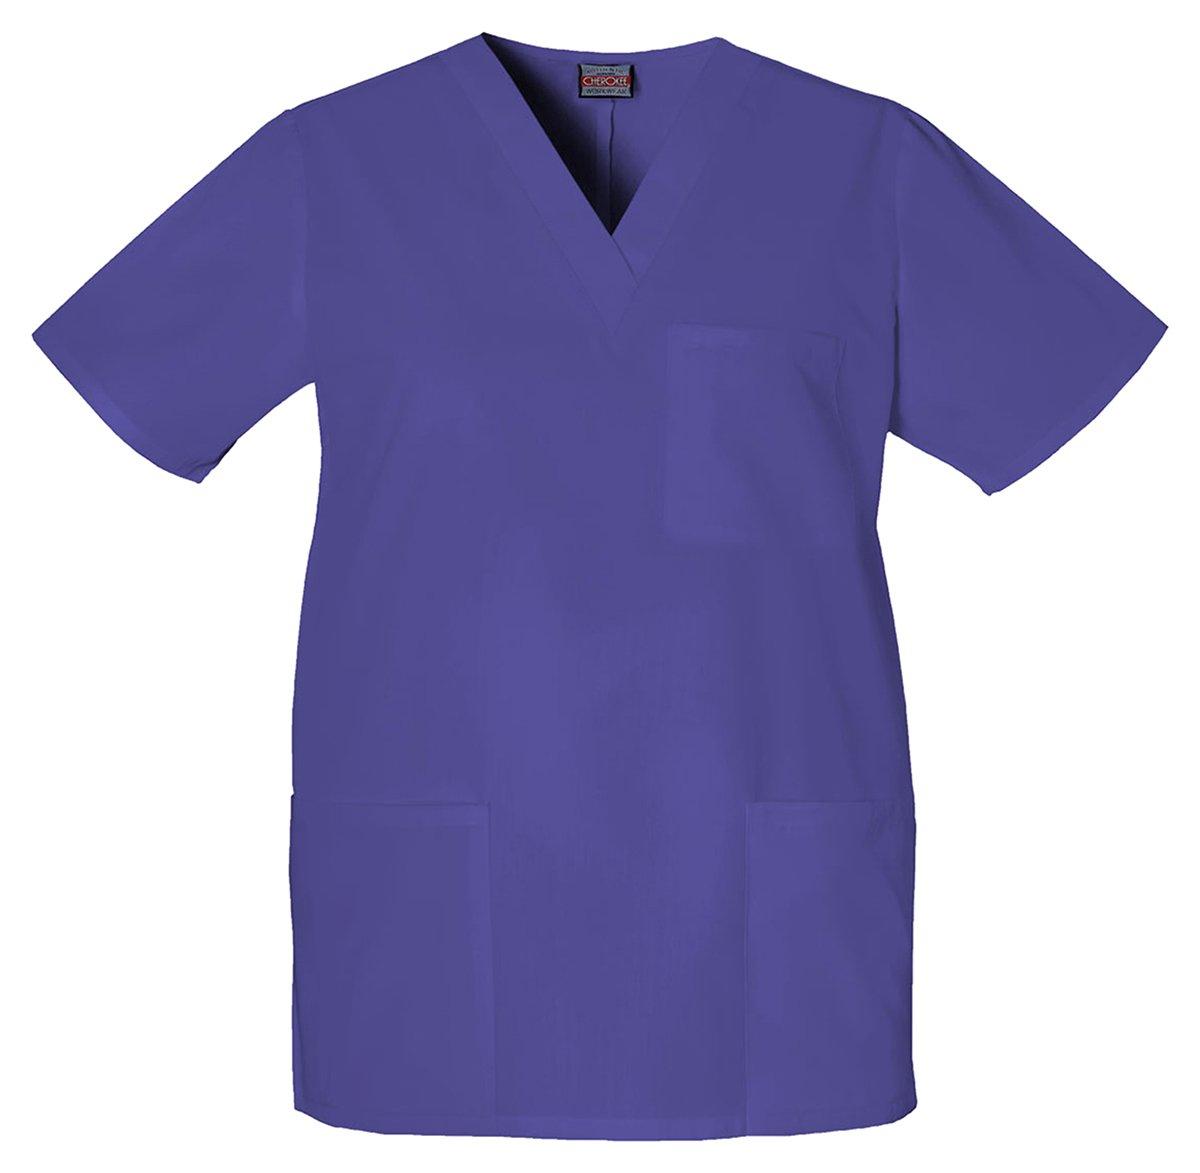 Cherokee Unisex Medical V-Neck Top_Grape_X-Large,4876